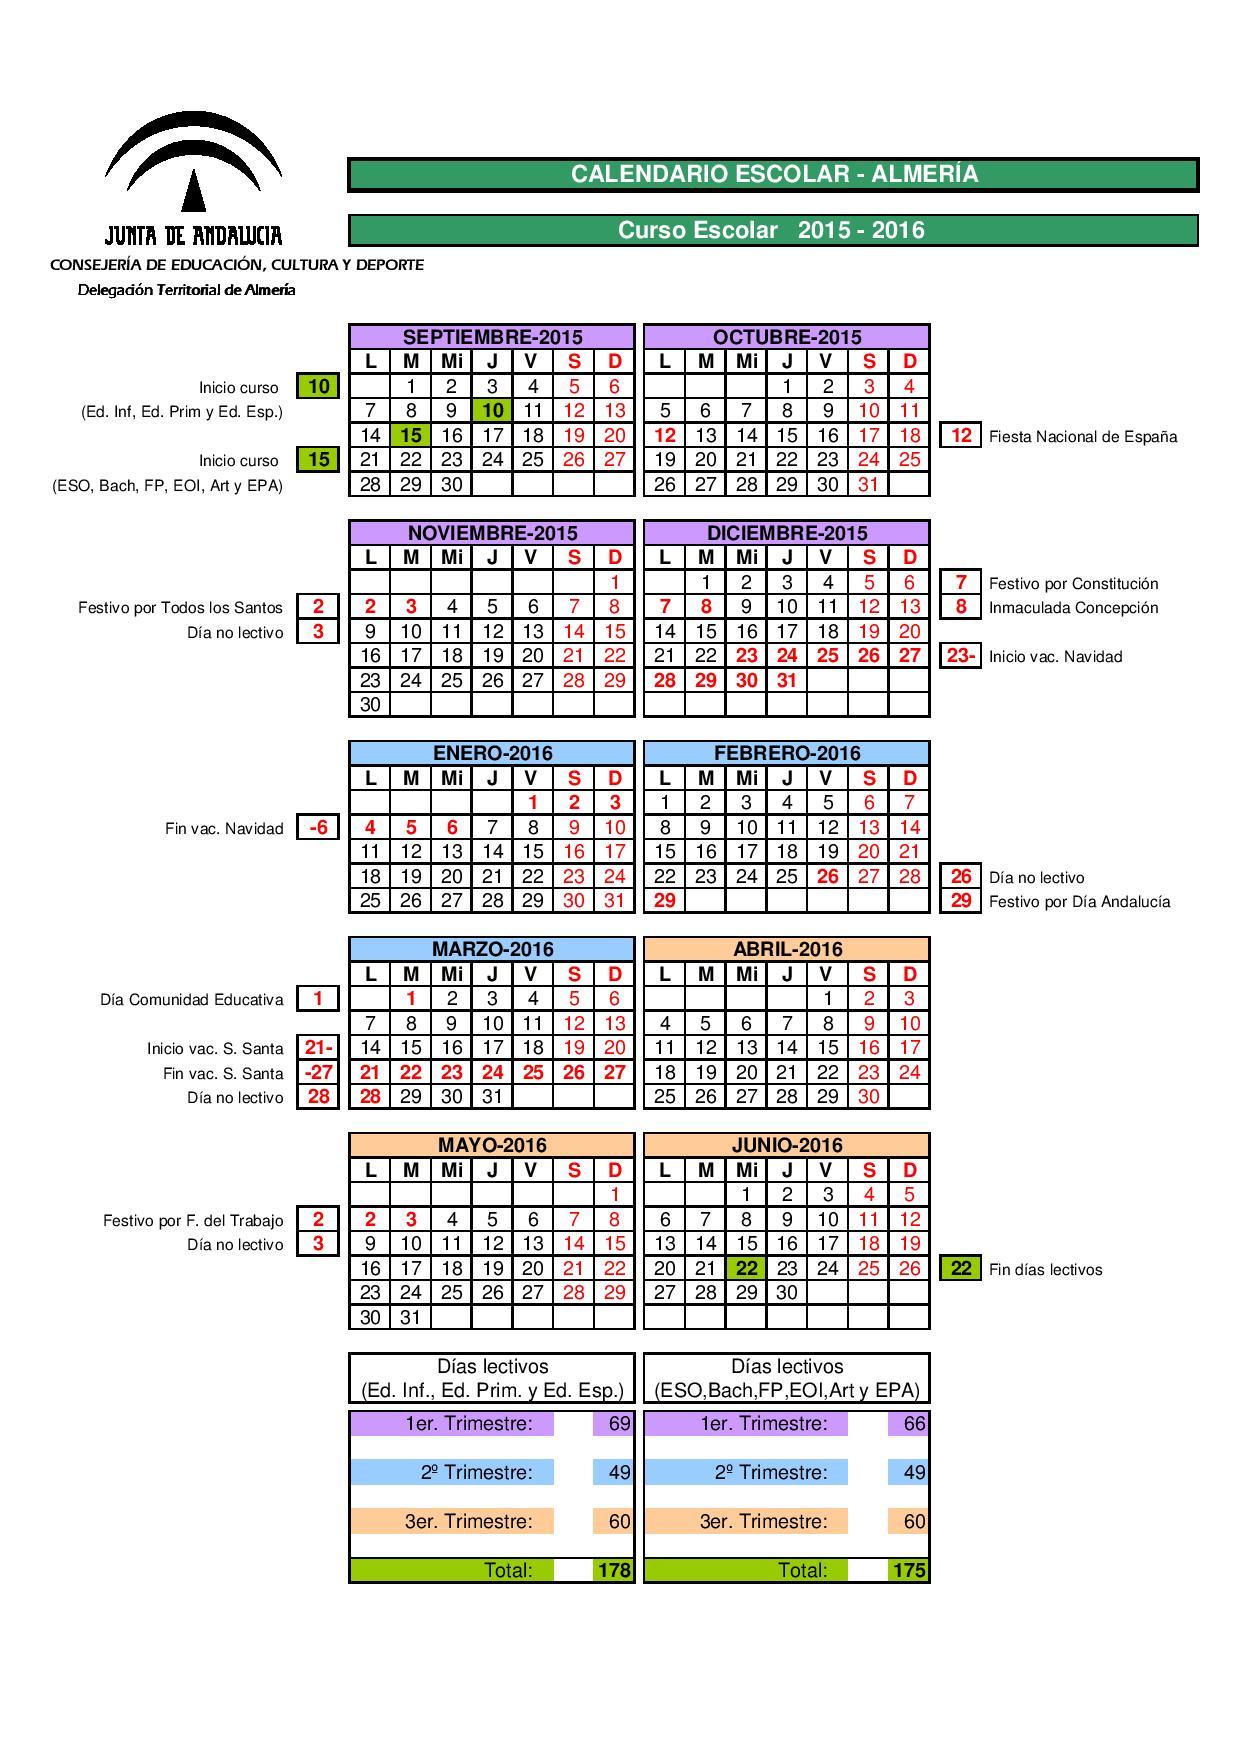 Calendario Escolar 2020 19 Almeria.Calendario Escolar Almeria Watershowspeakers